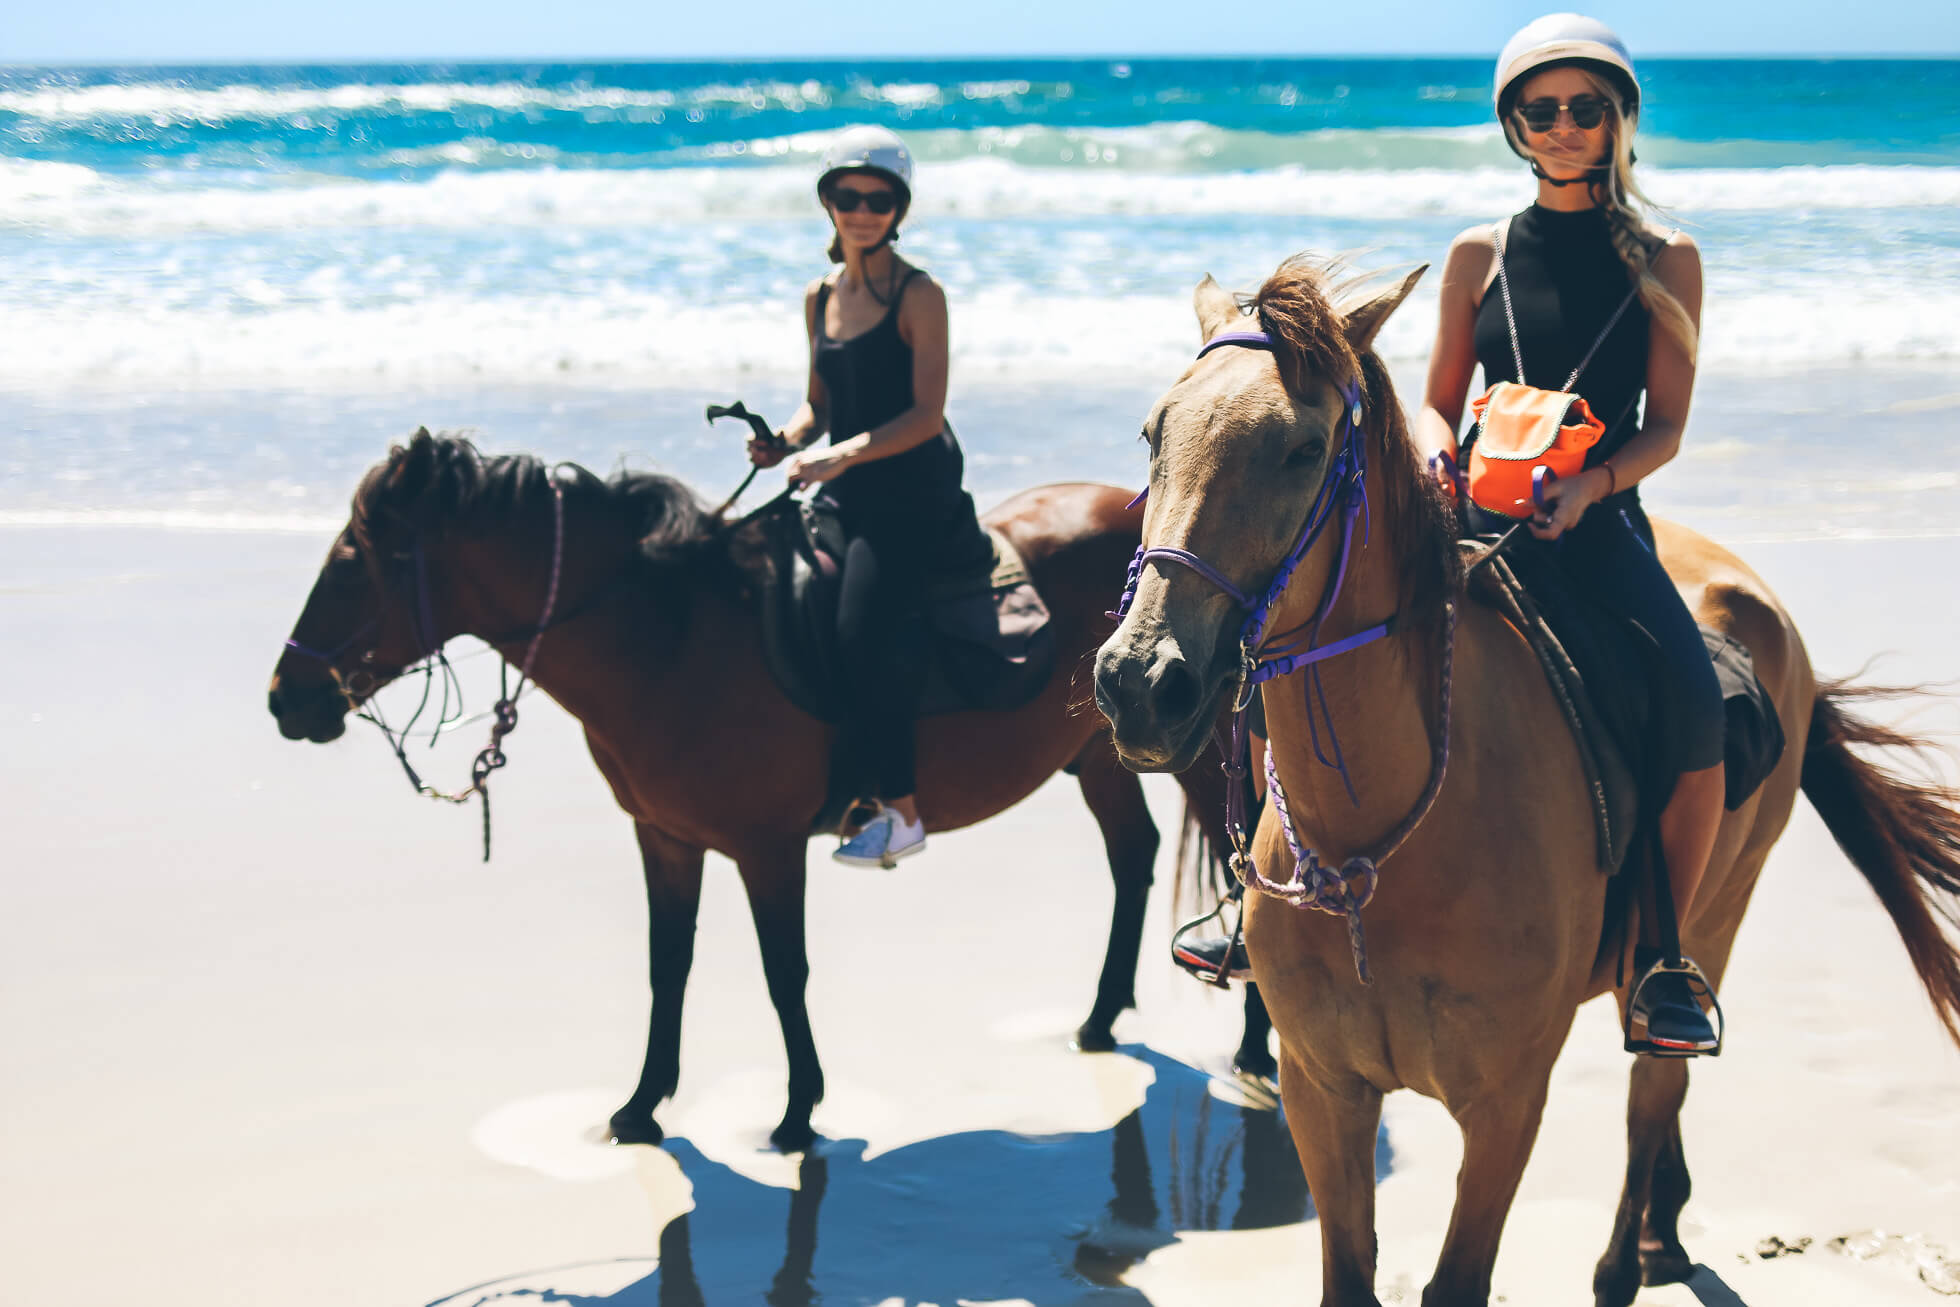 janni-deler-horseback-riding-byronbayIMG_1483